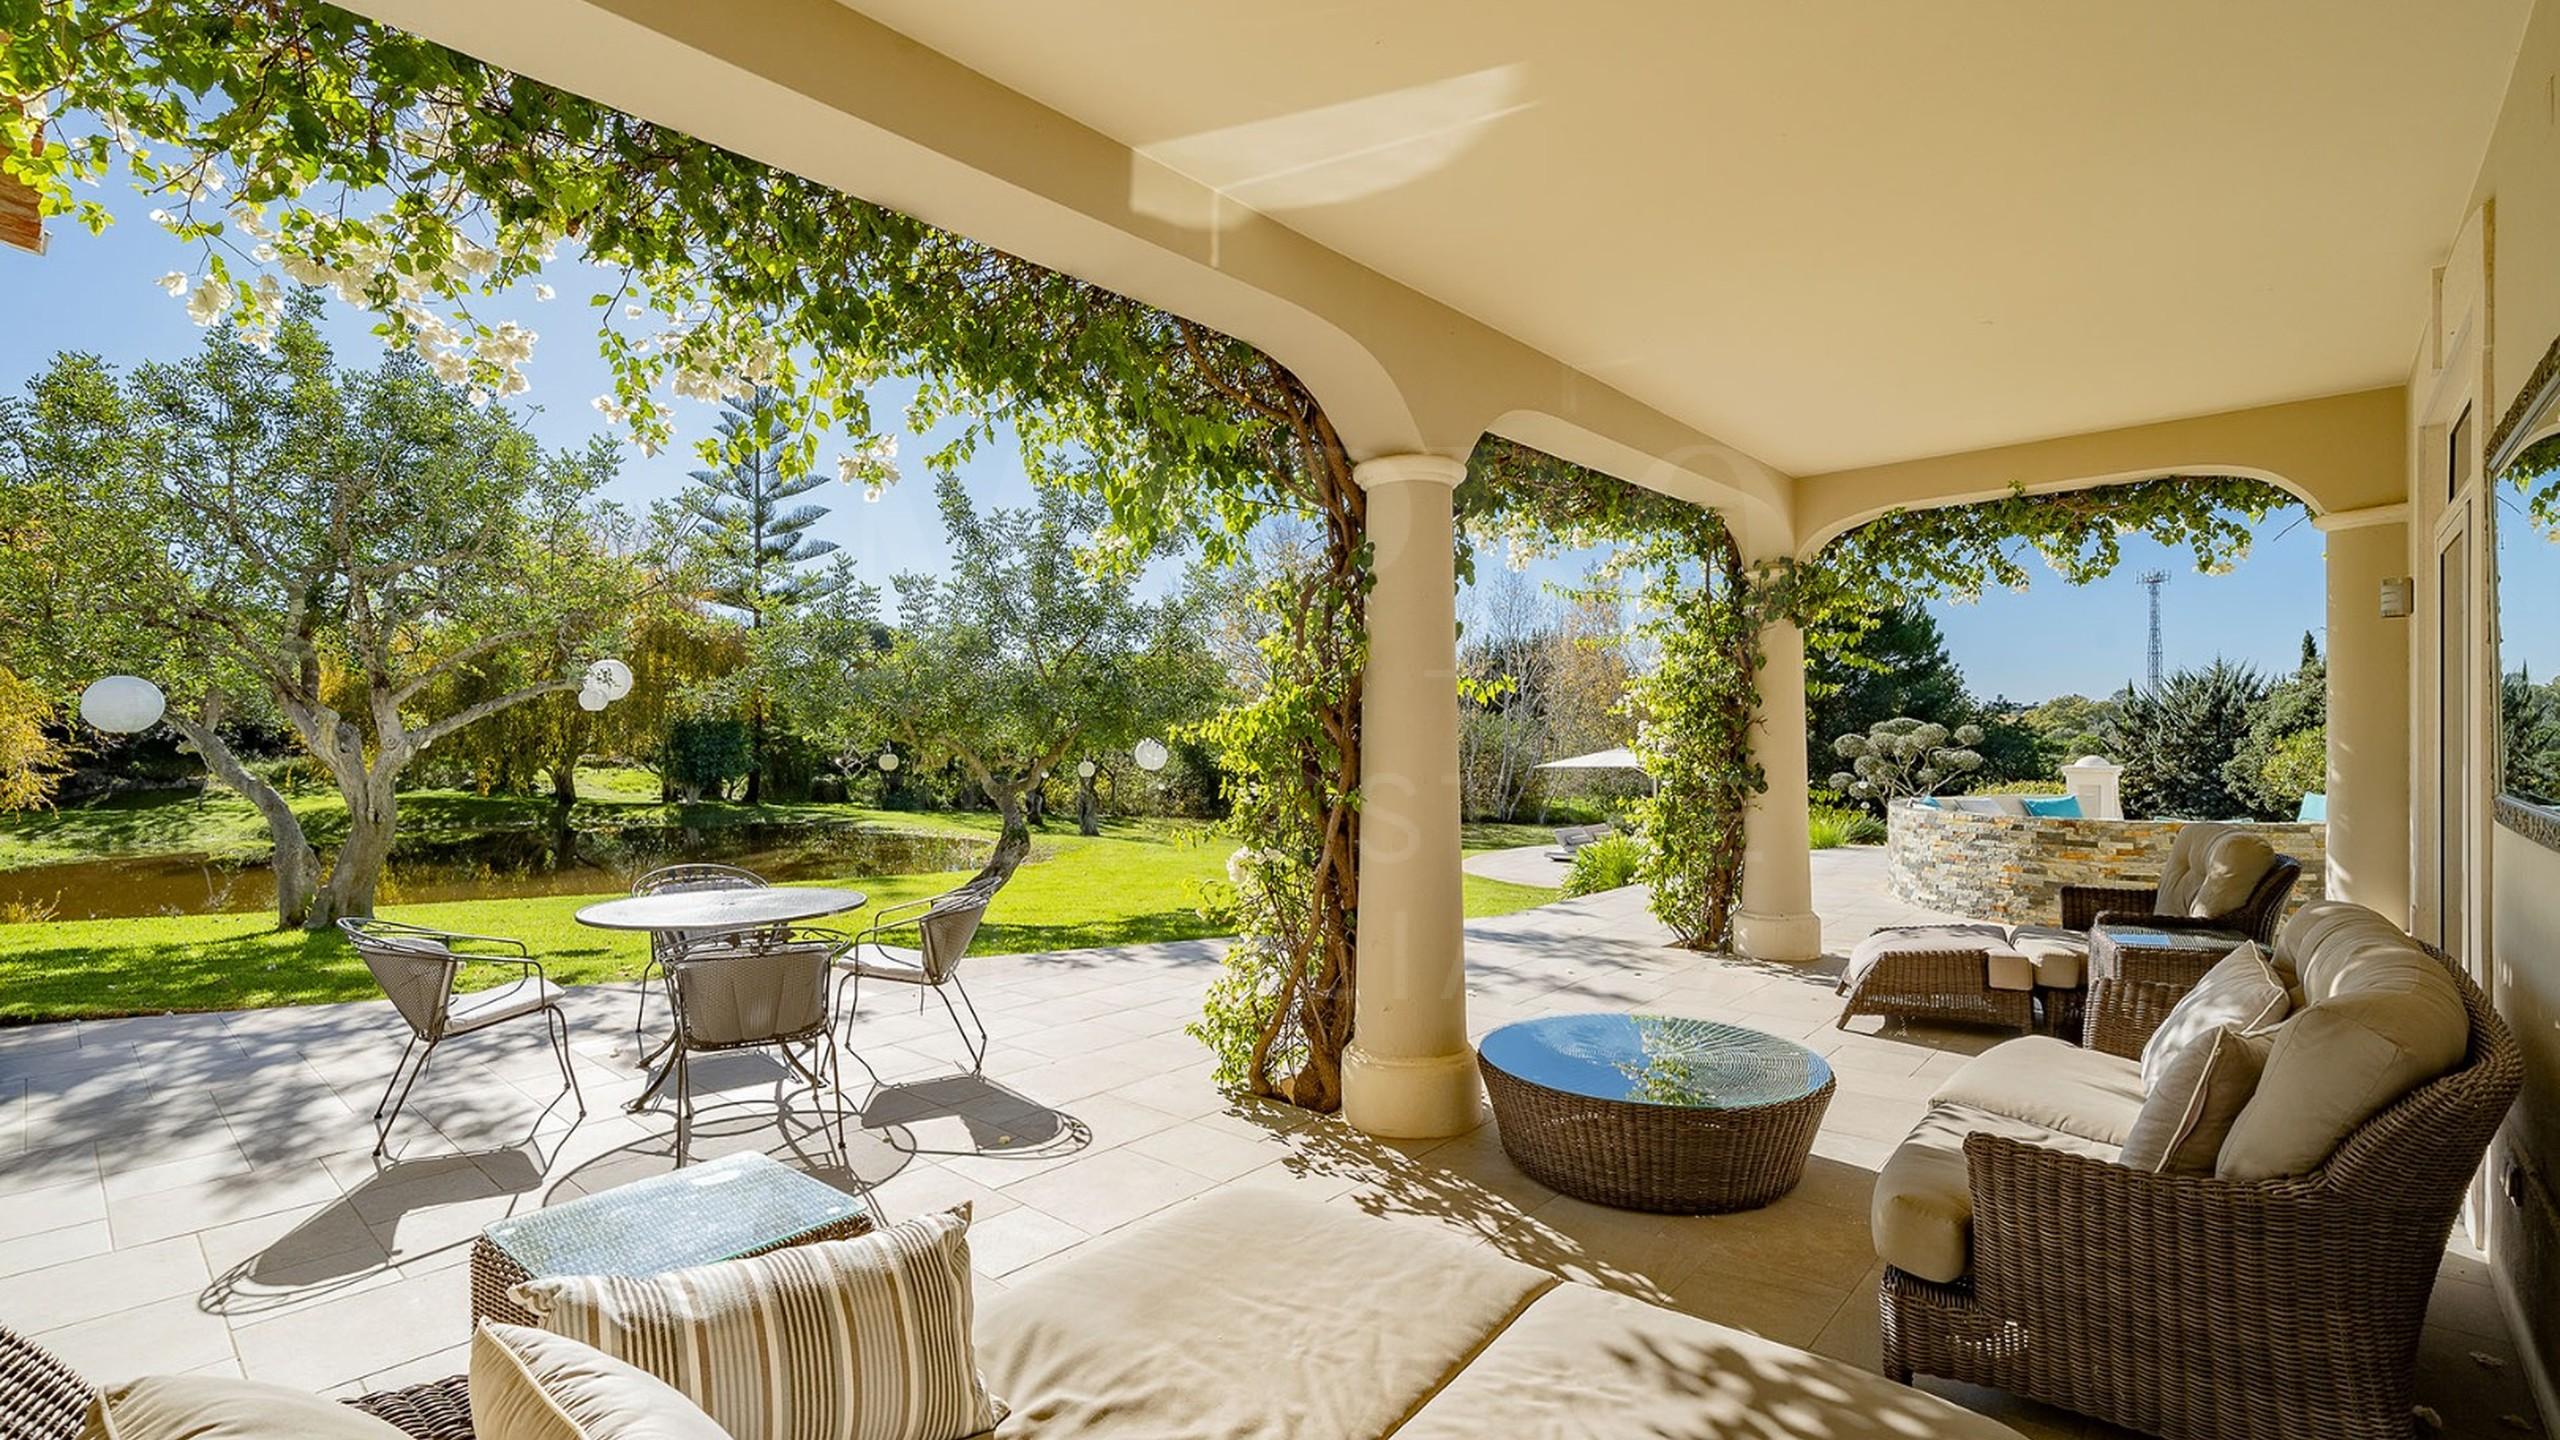 Jardim com sofás